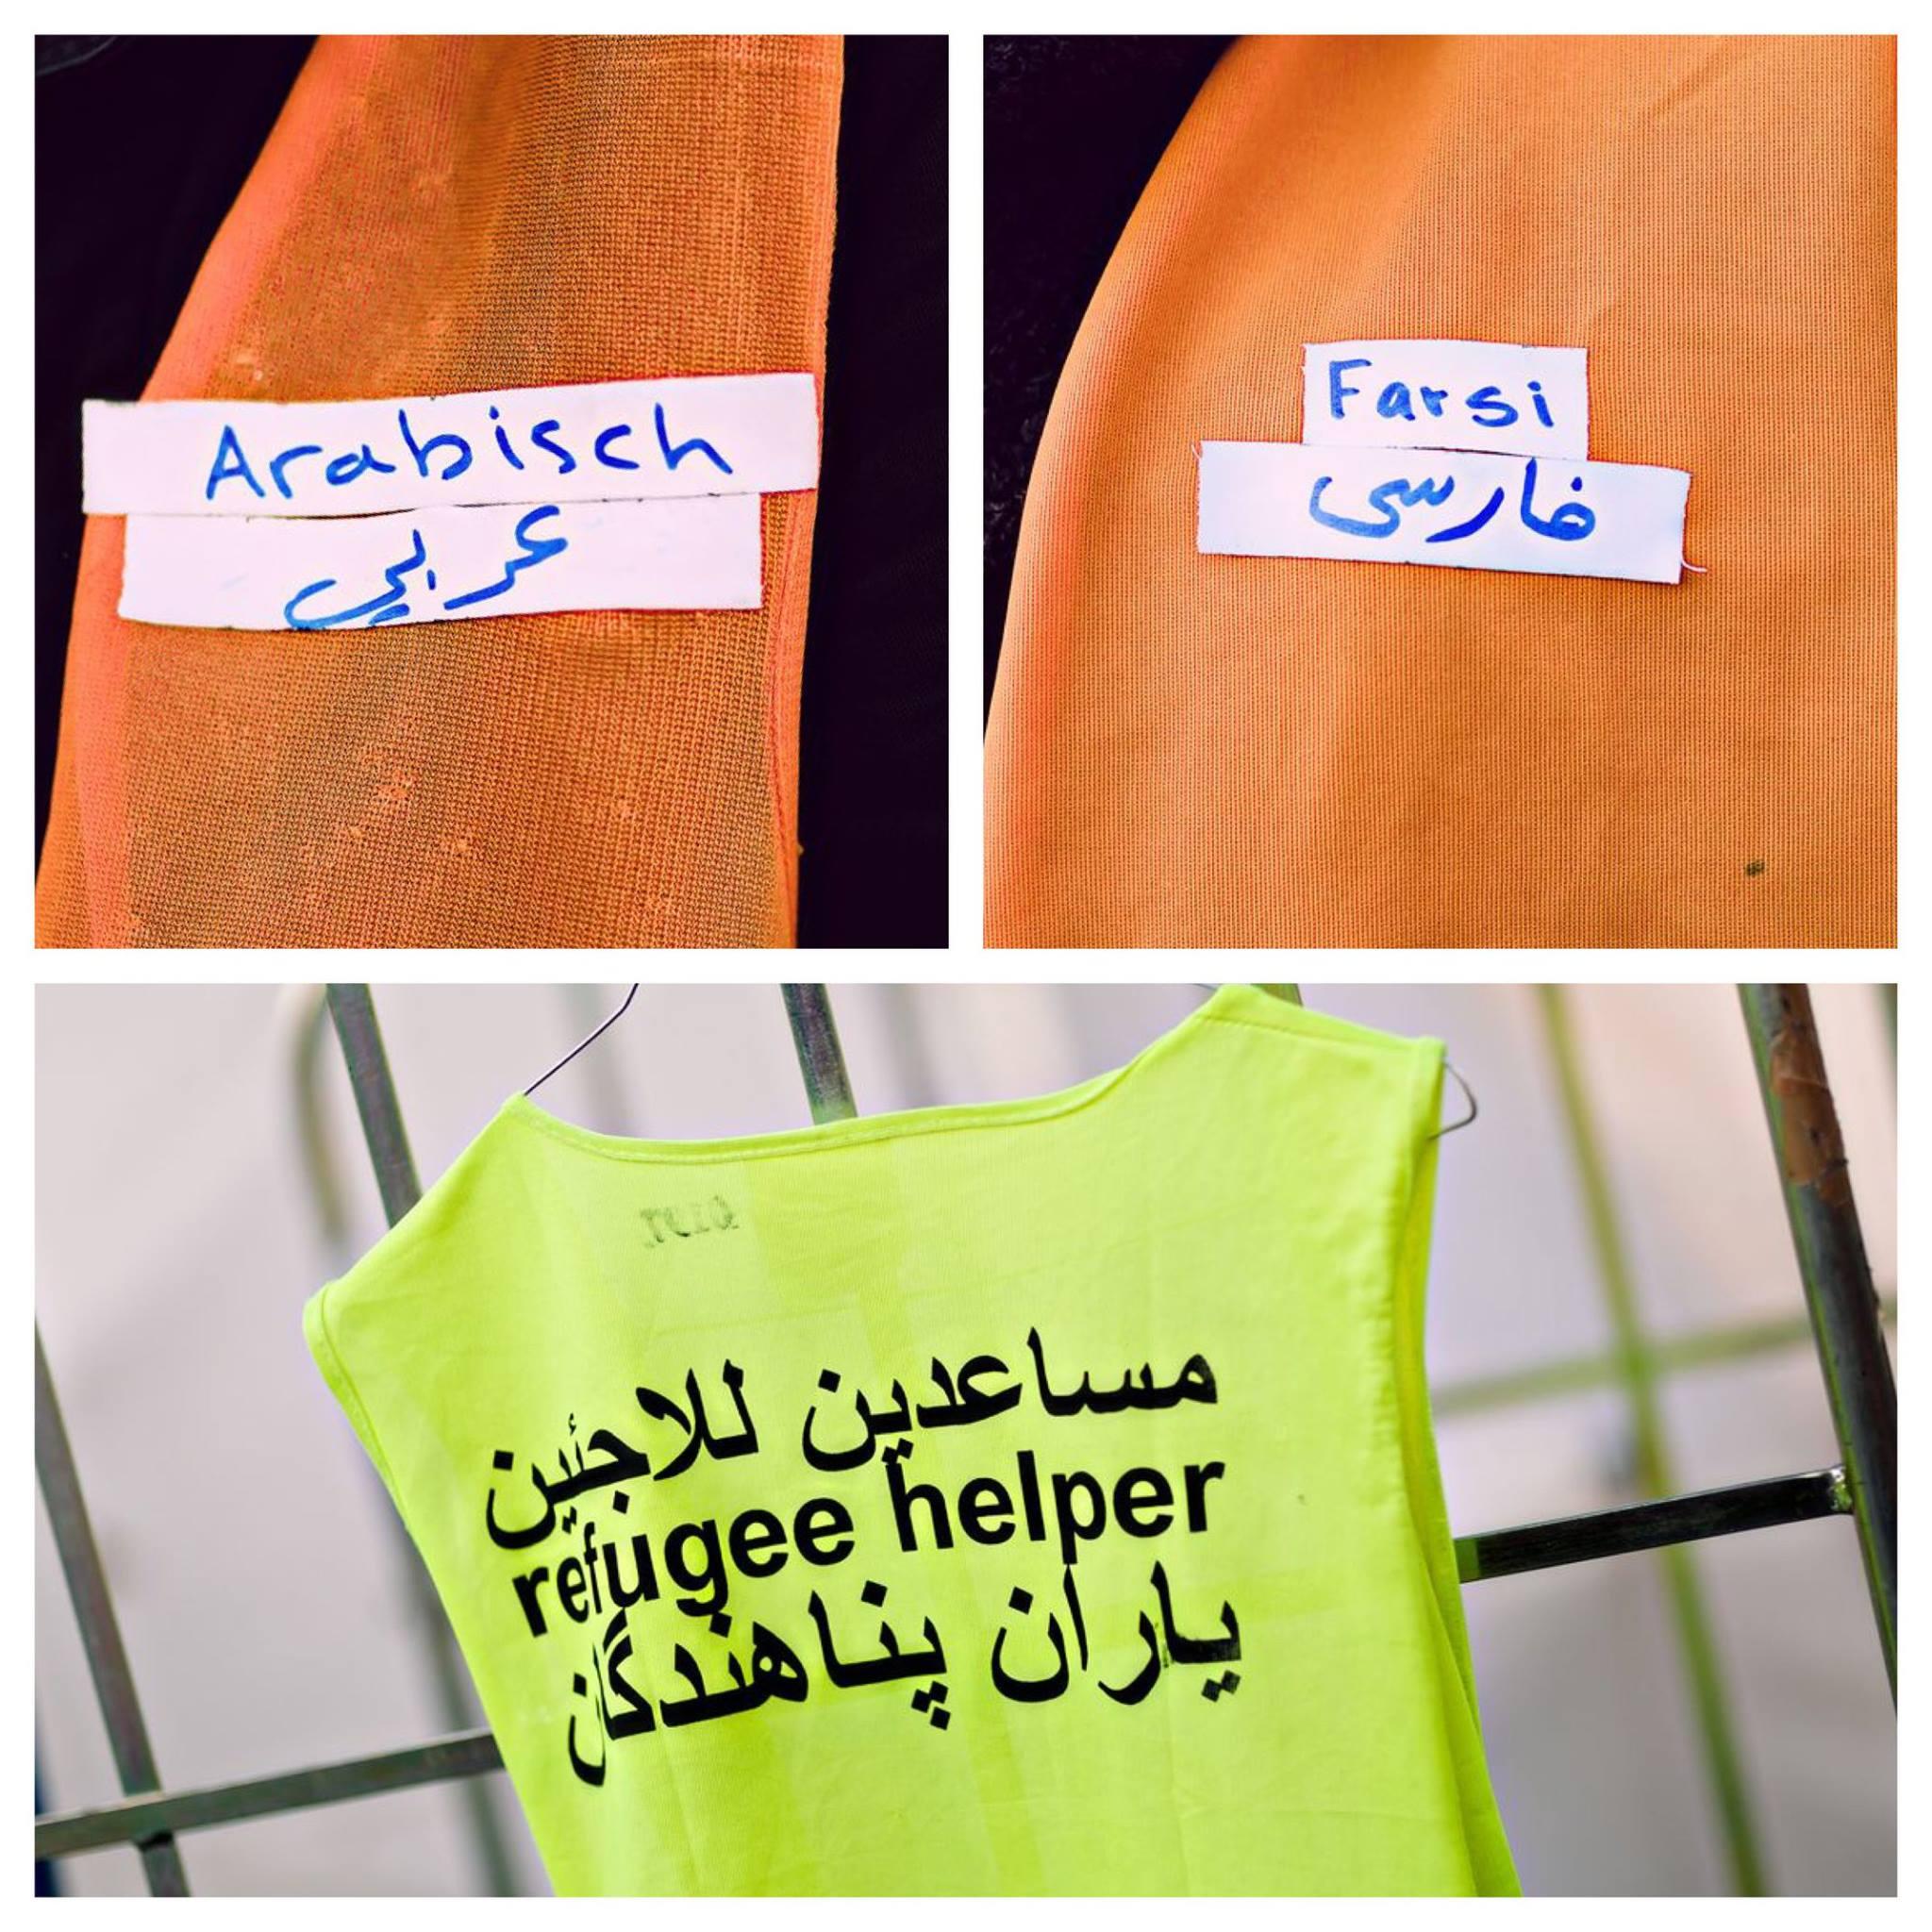 Flüchtlingshilfe am Hauptbahnhof